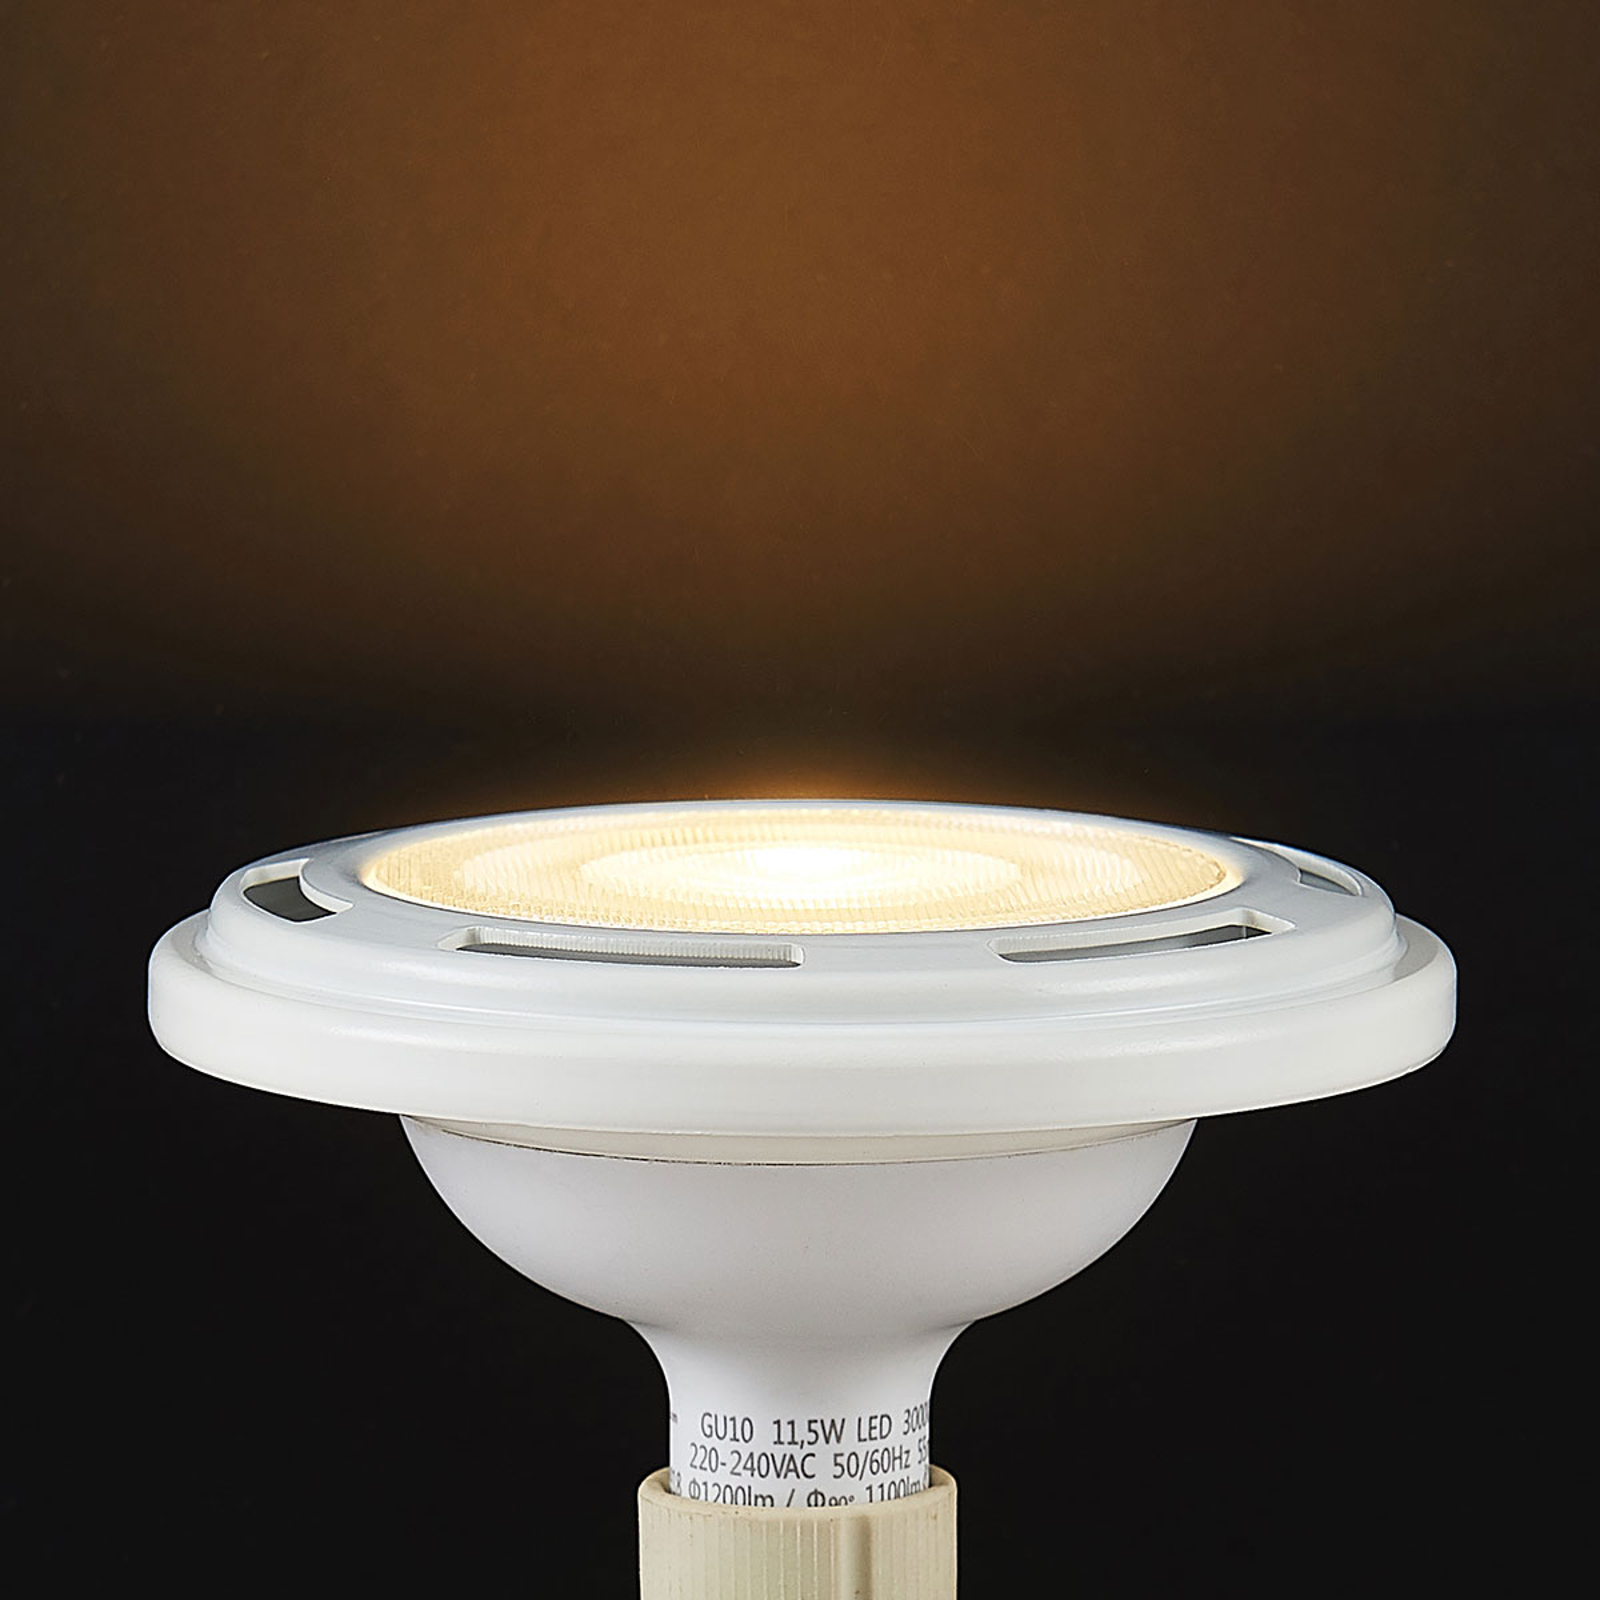 LED-heijastinlamppu GU10 ES111 11,5 W himm.